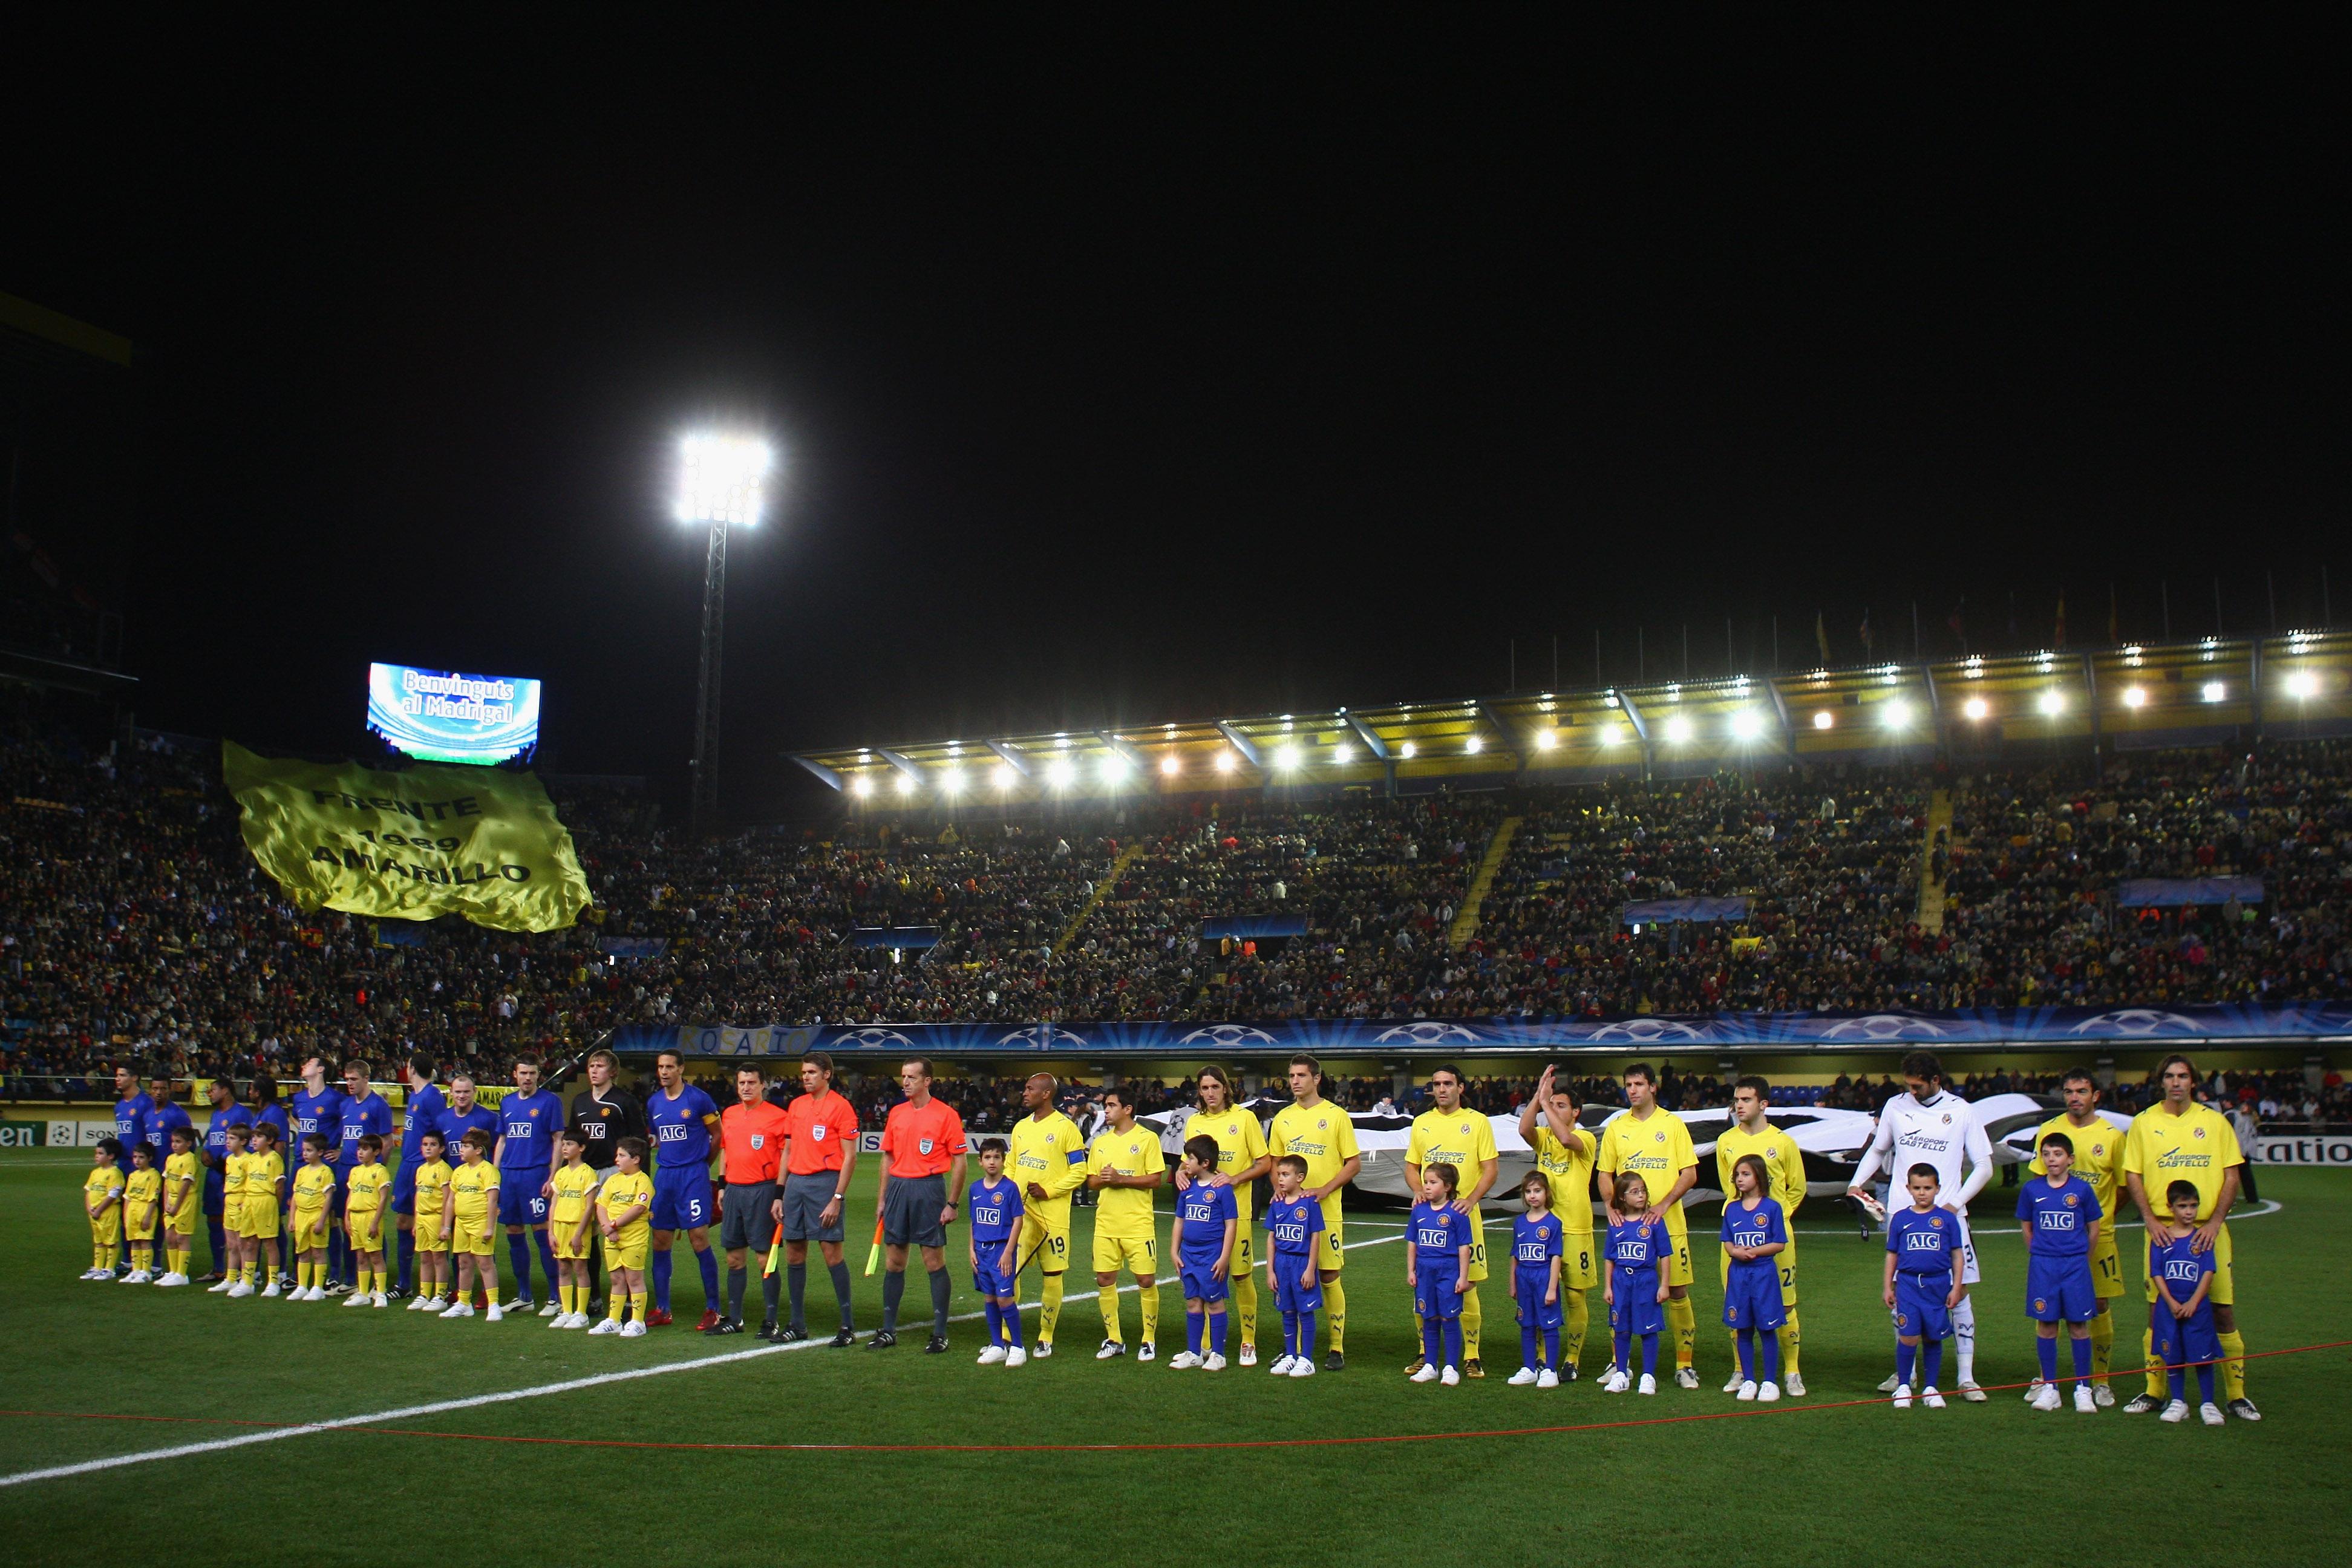 Villarreal v Manchester United - UEFA Champions League